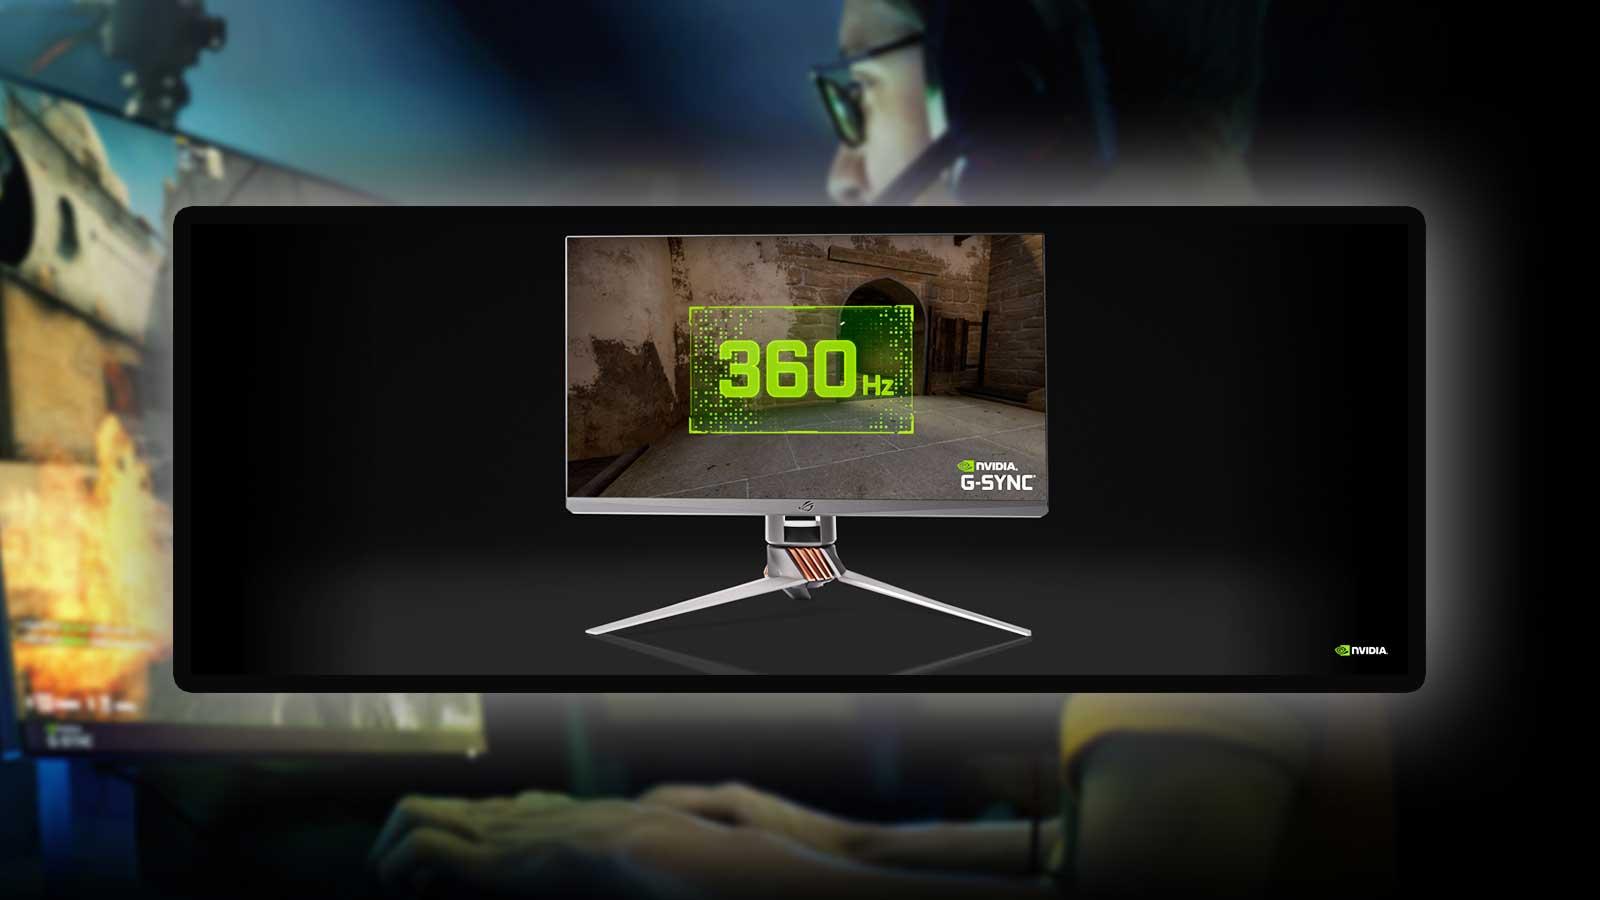 nvidia geforce g sync 360hz display pic babt v2